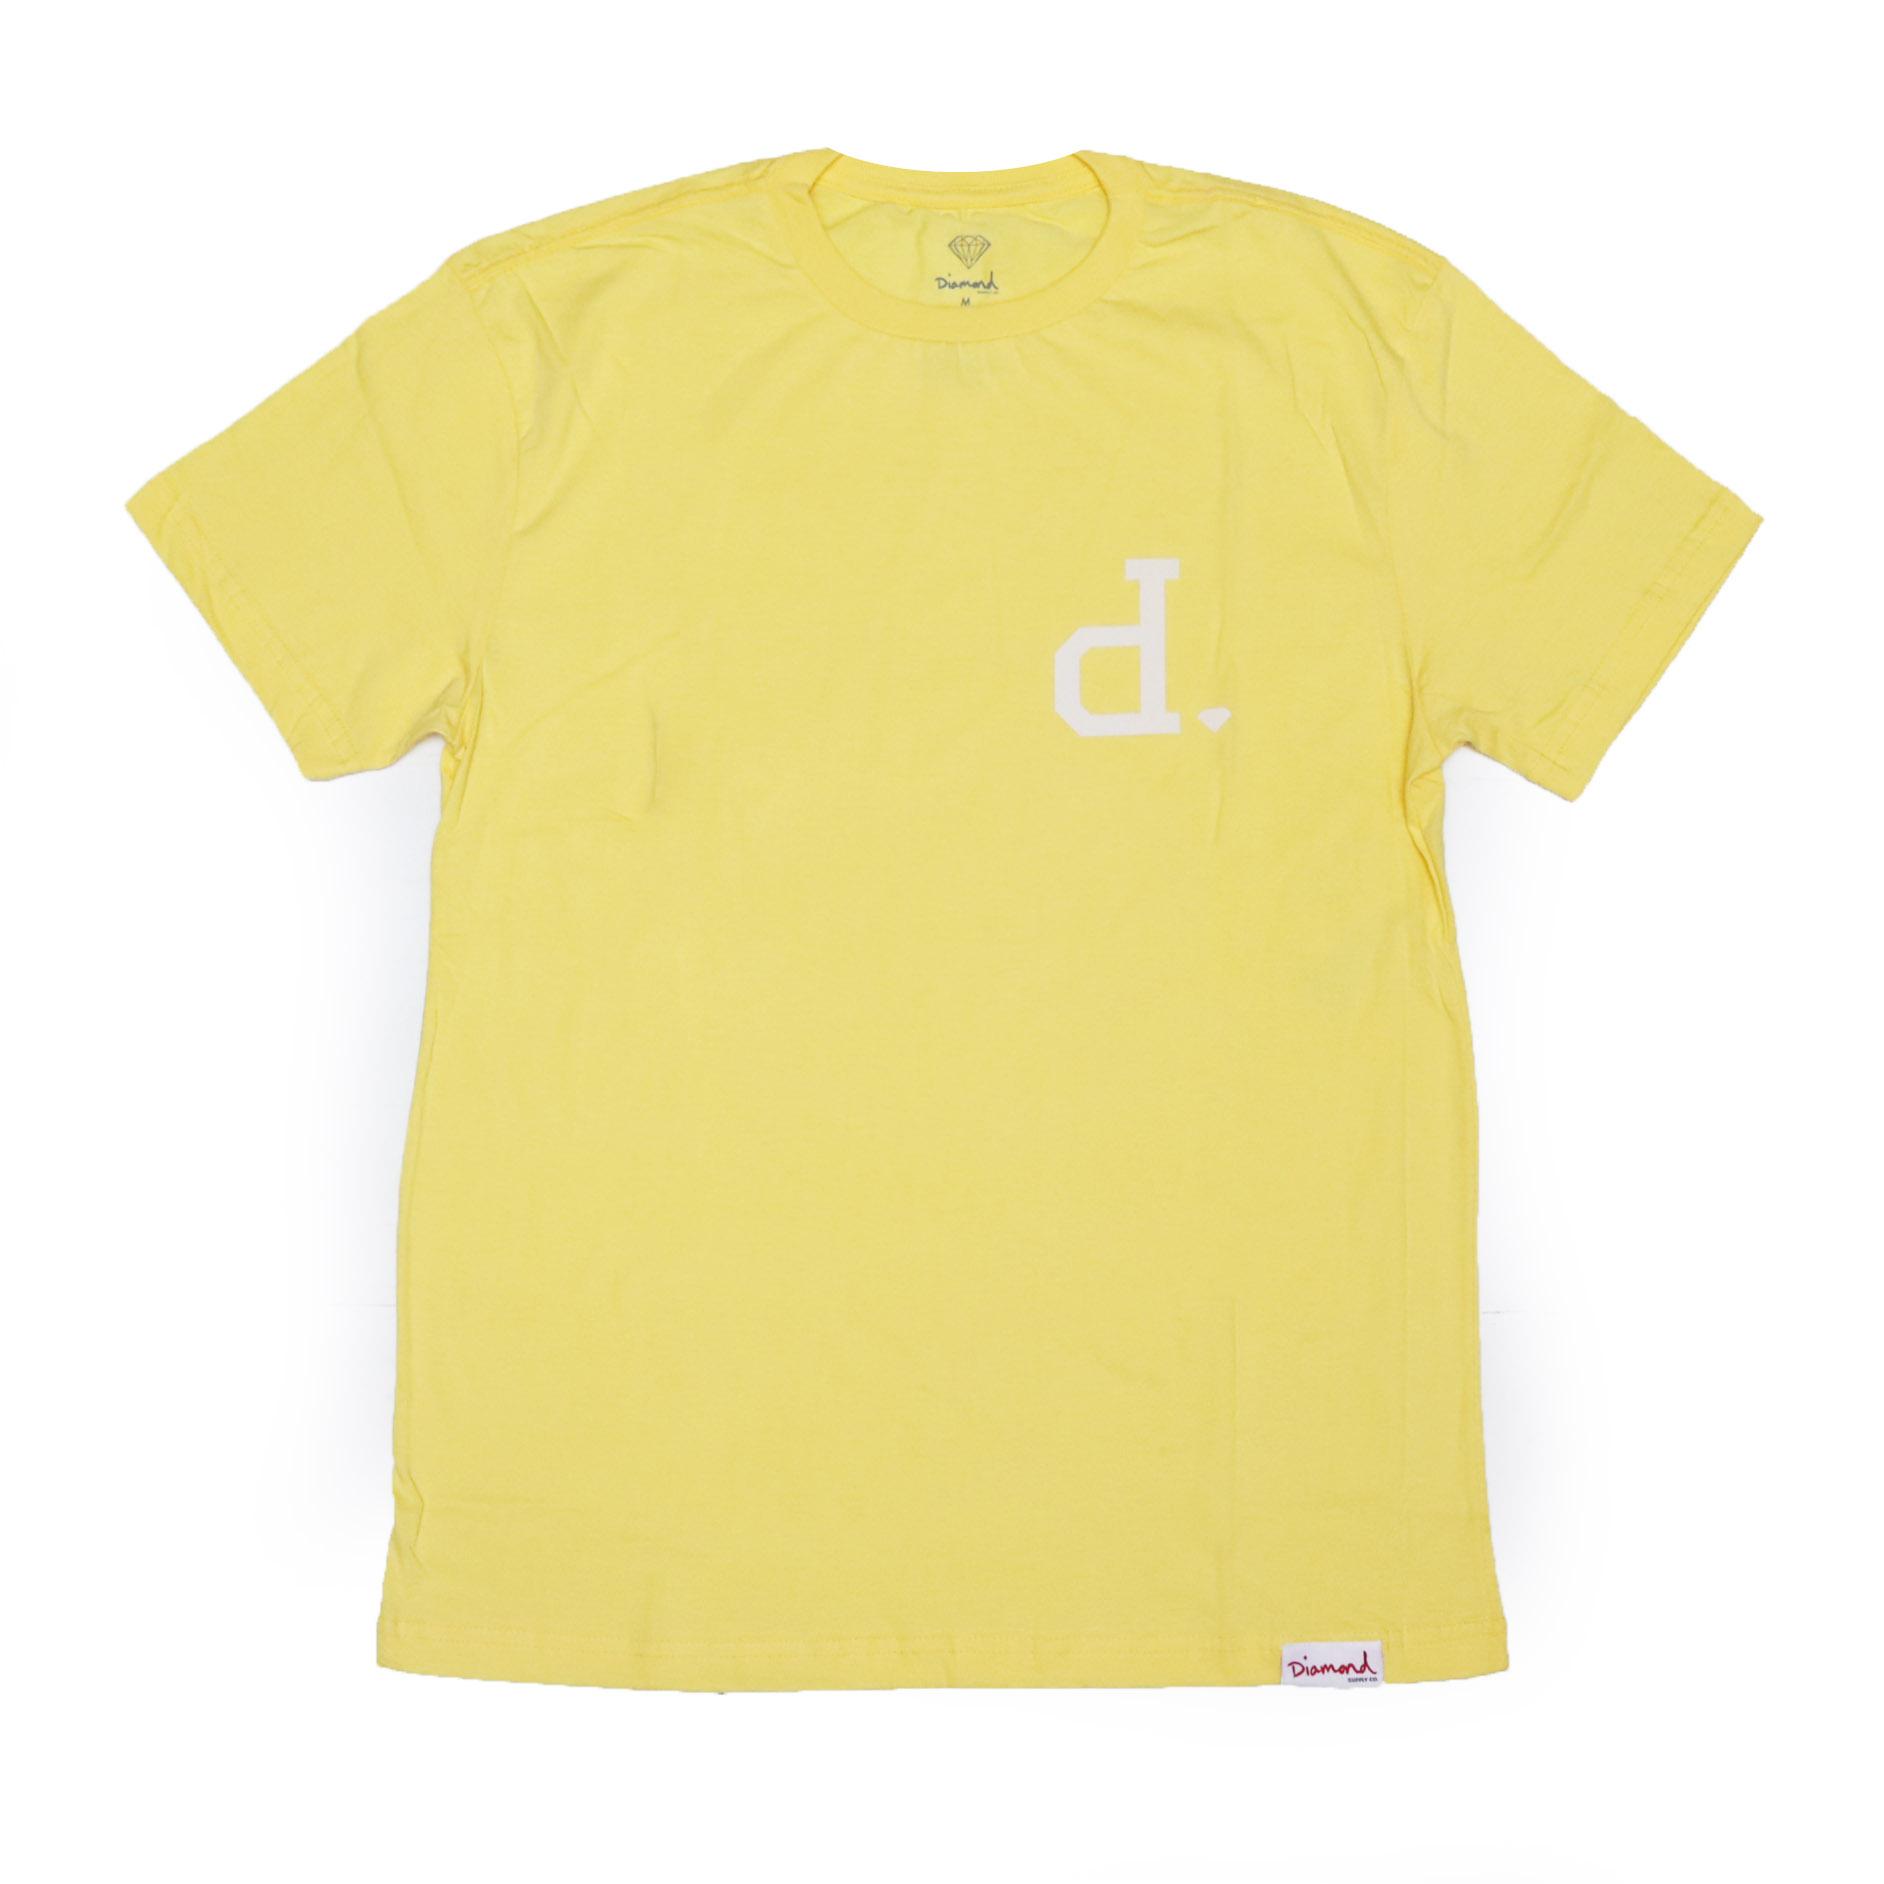 Camiseta Diamond Un Polo - Amarelo/Branco